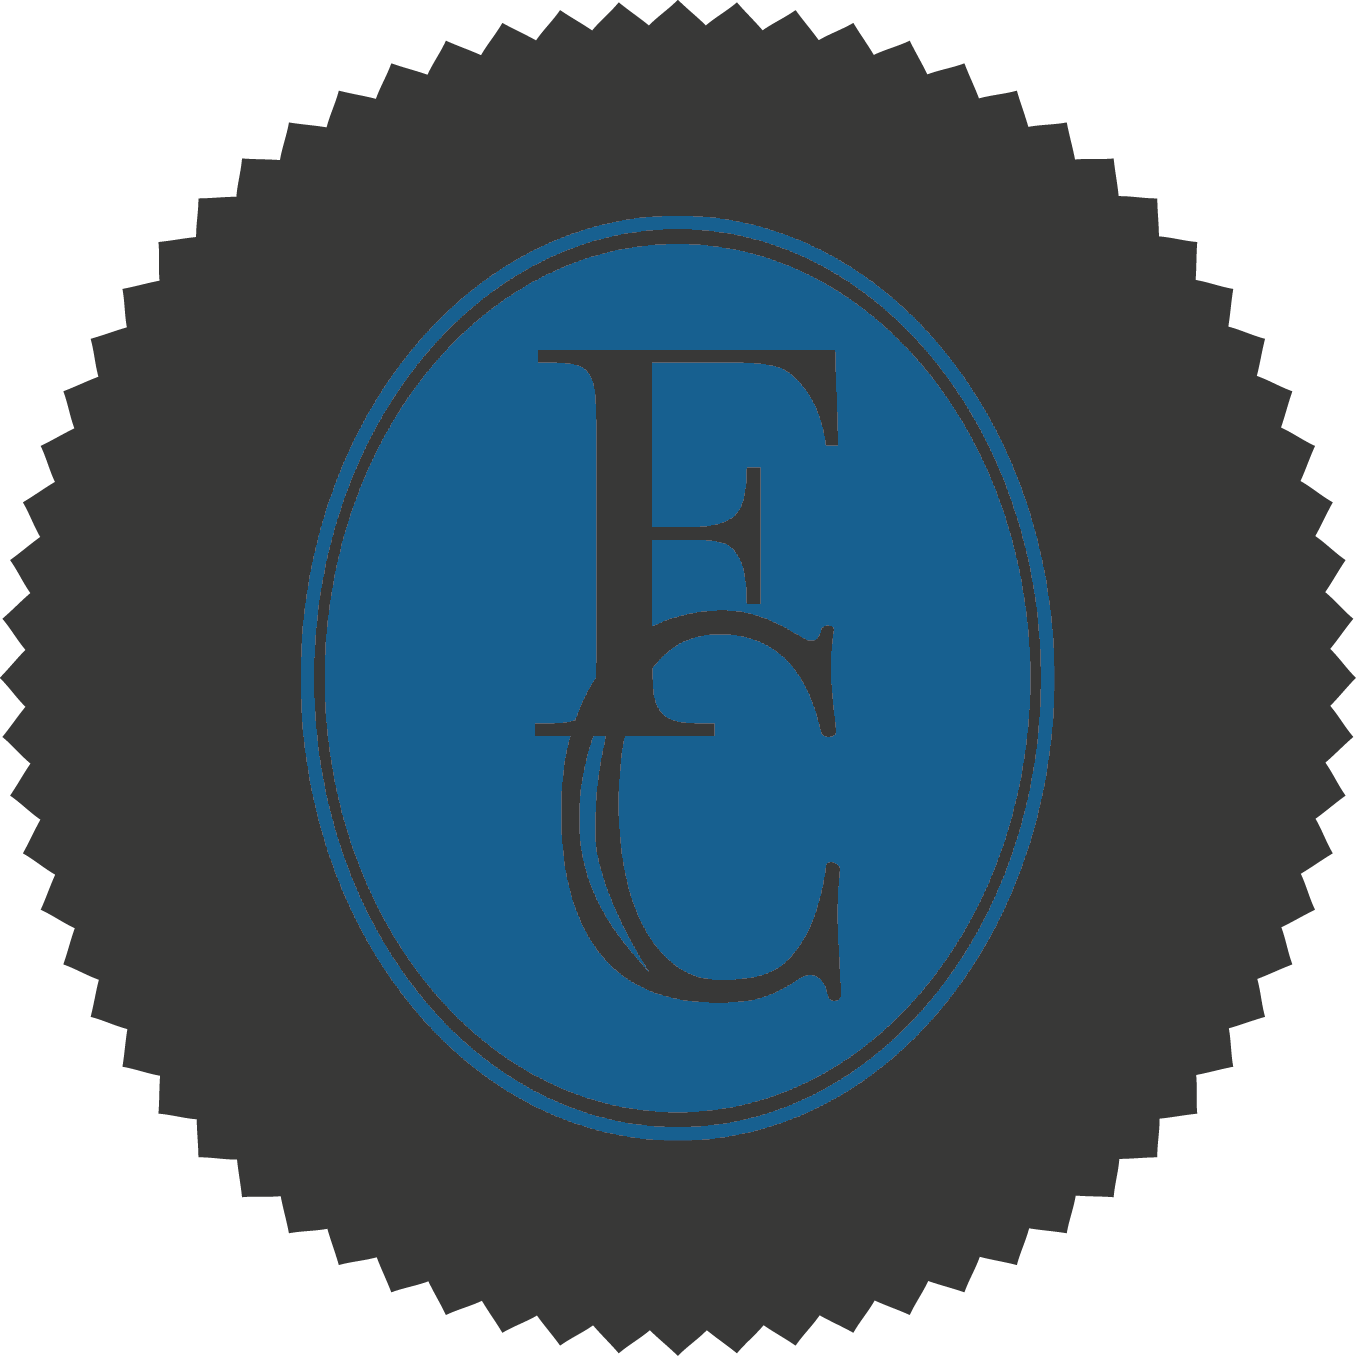 factoringchannel badge.png